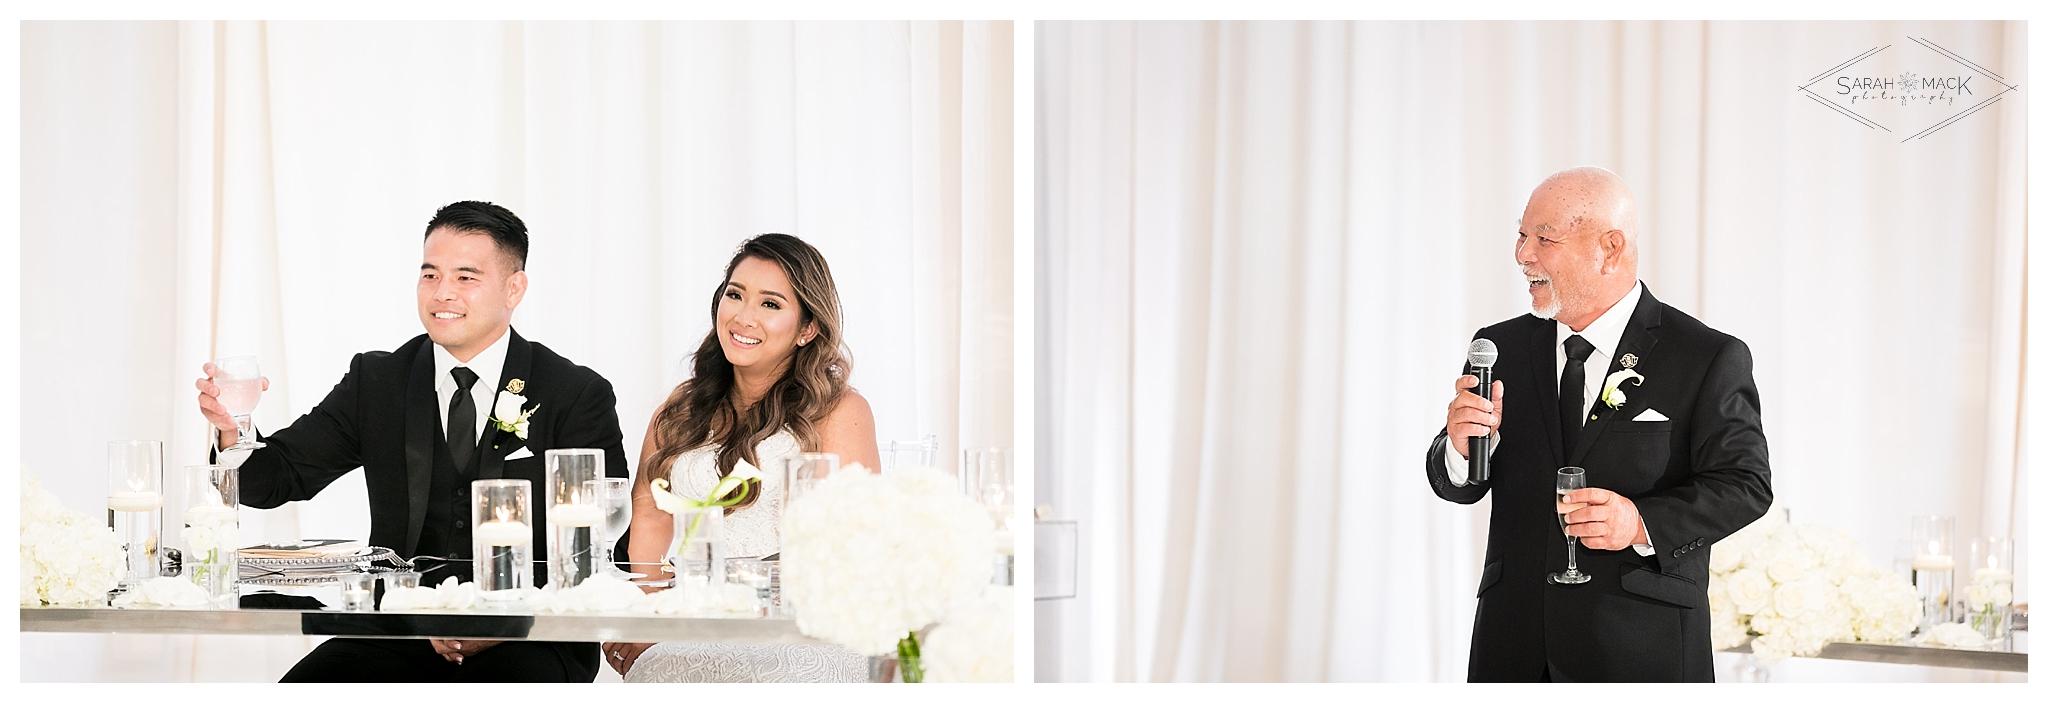 LE-Avenue-of-the-Arts-Costa-Mesa-Wedding-Photography-0189.jpg